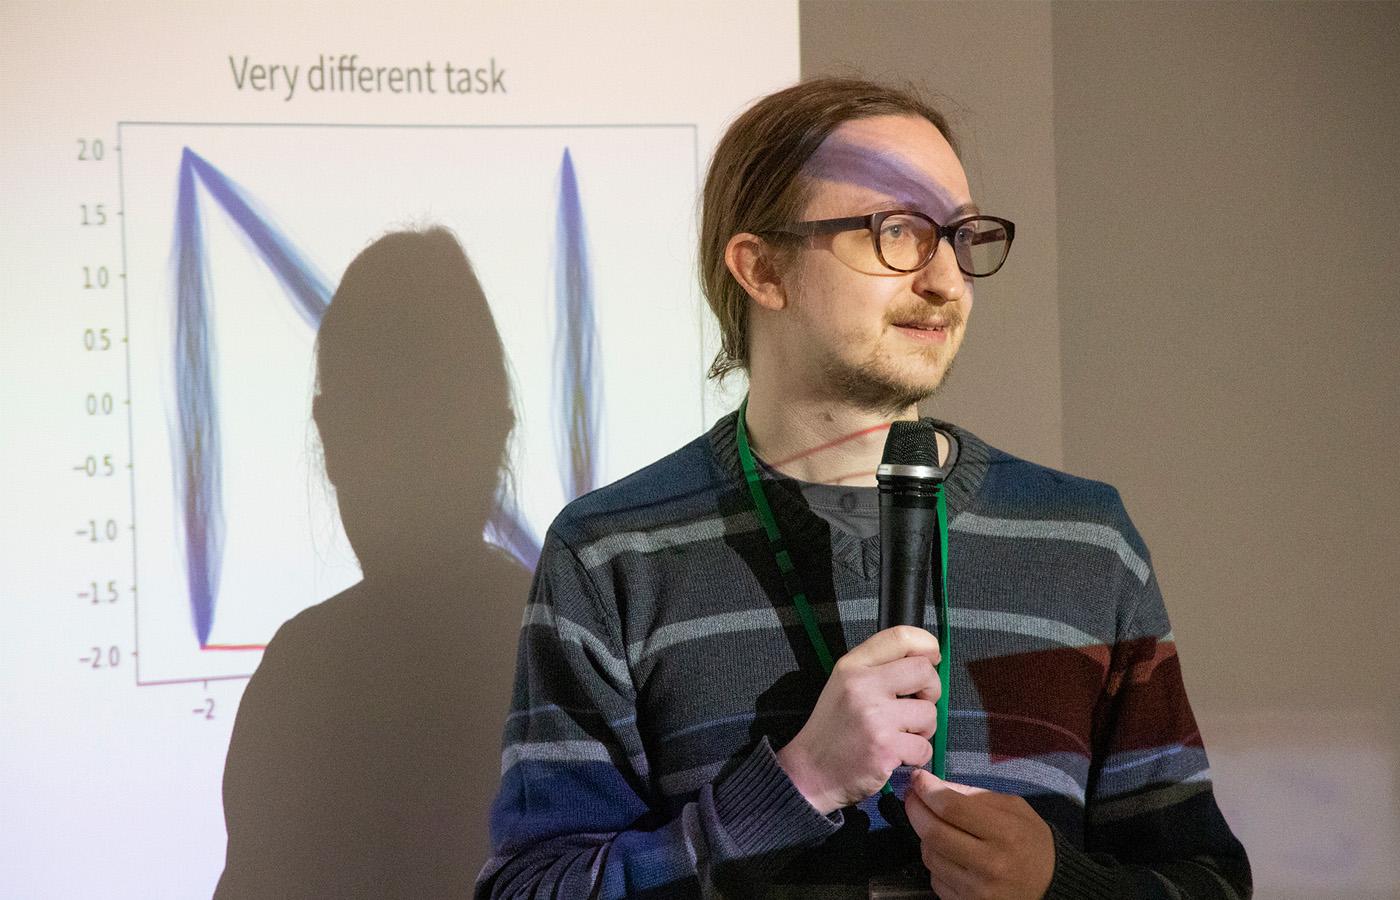 Dr. Nicholas Guttenberg presenting